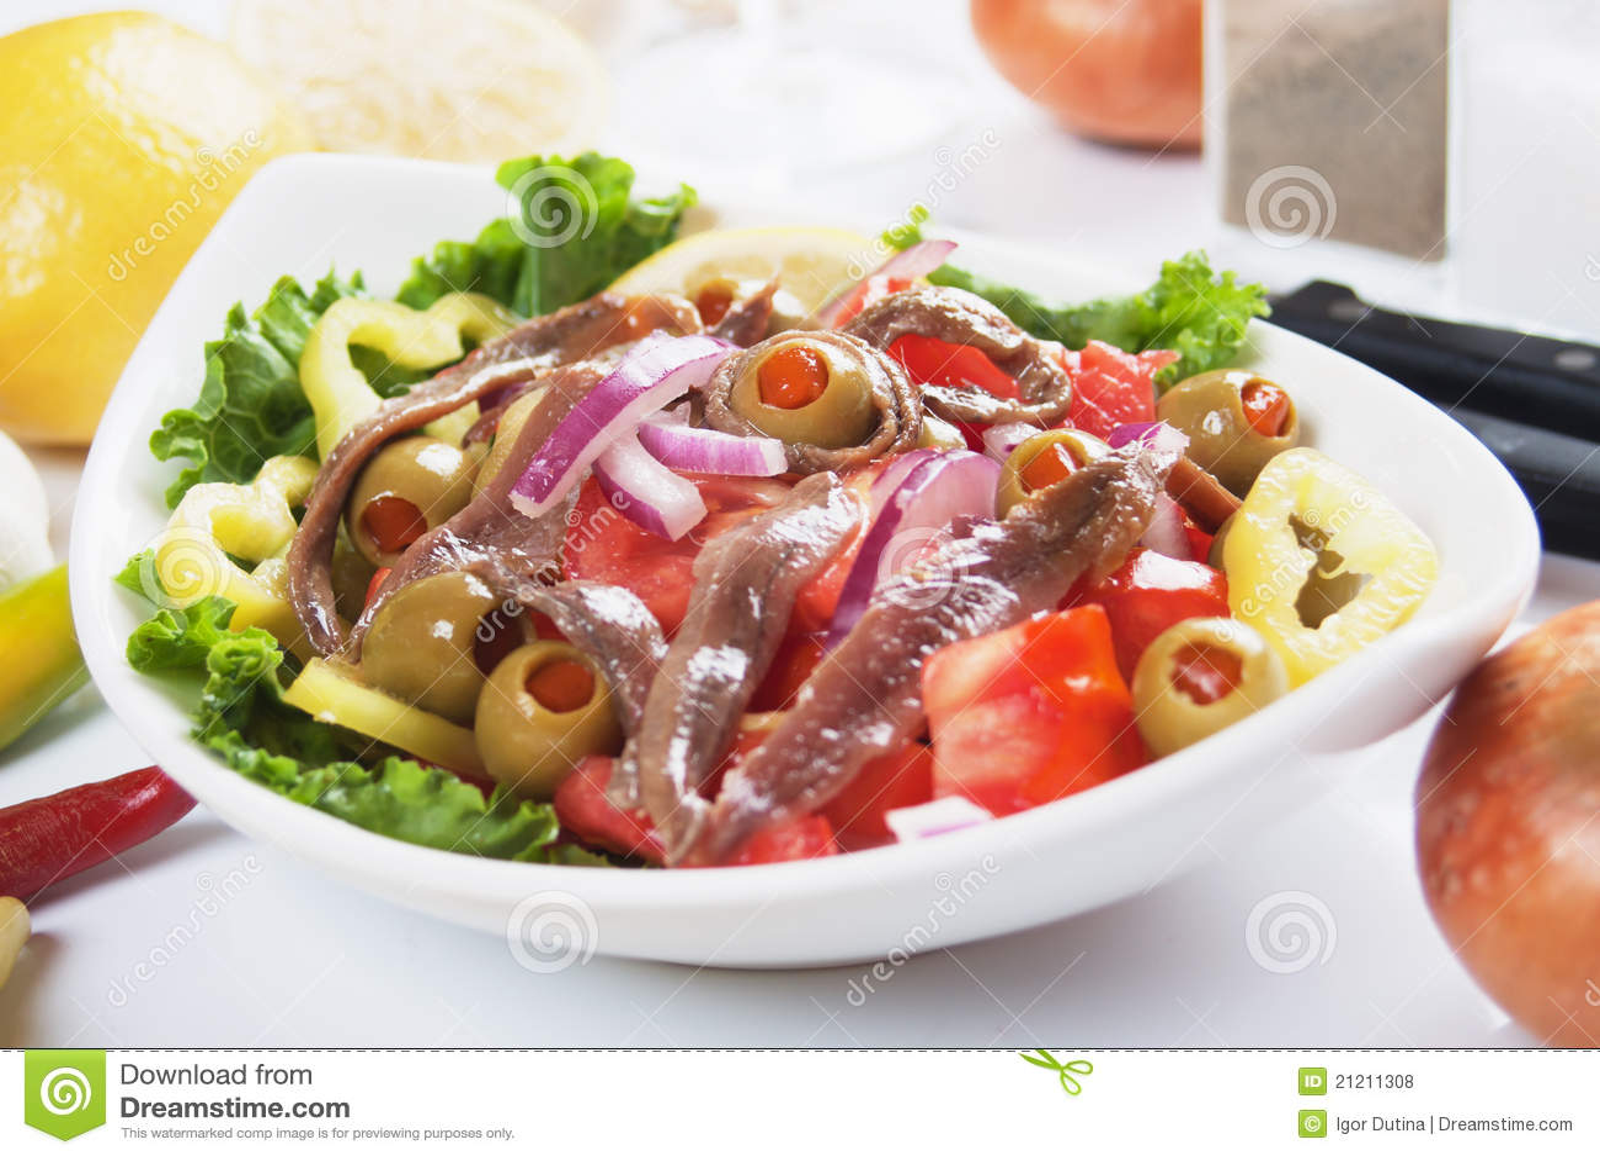 Anchovy Salad Royalty Free Stock Photos - Image: 21211308